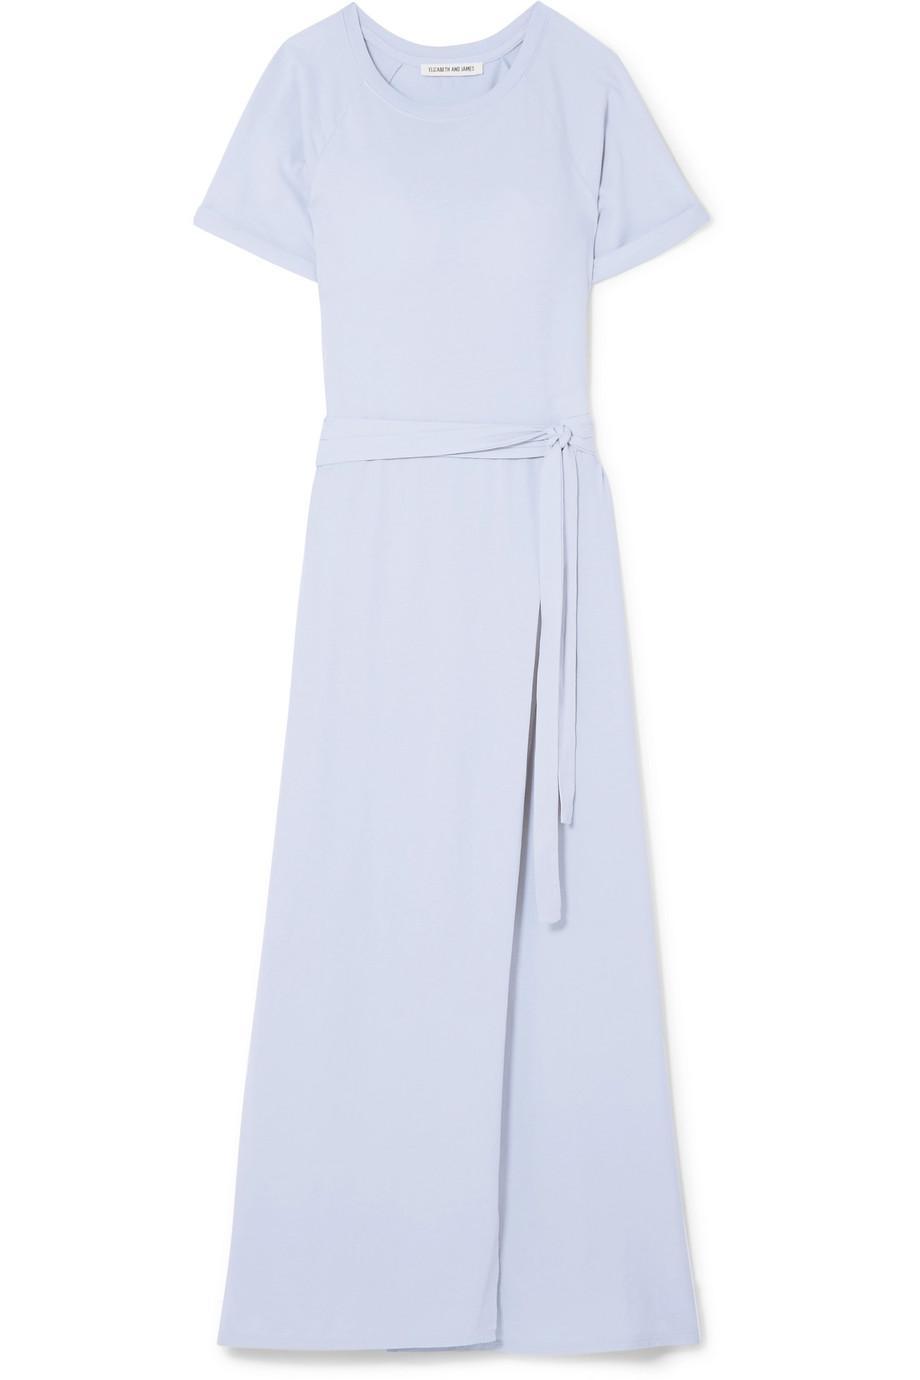 Welles Belted Cotton-jersey Maxi Dress - Light blue Elizabeth & James EH4Q0Gjd